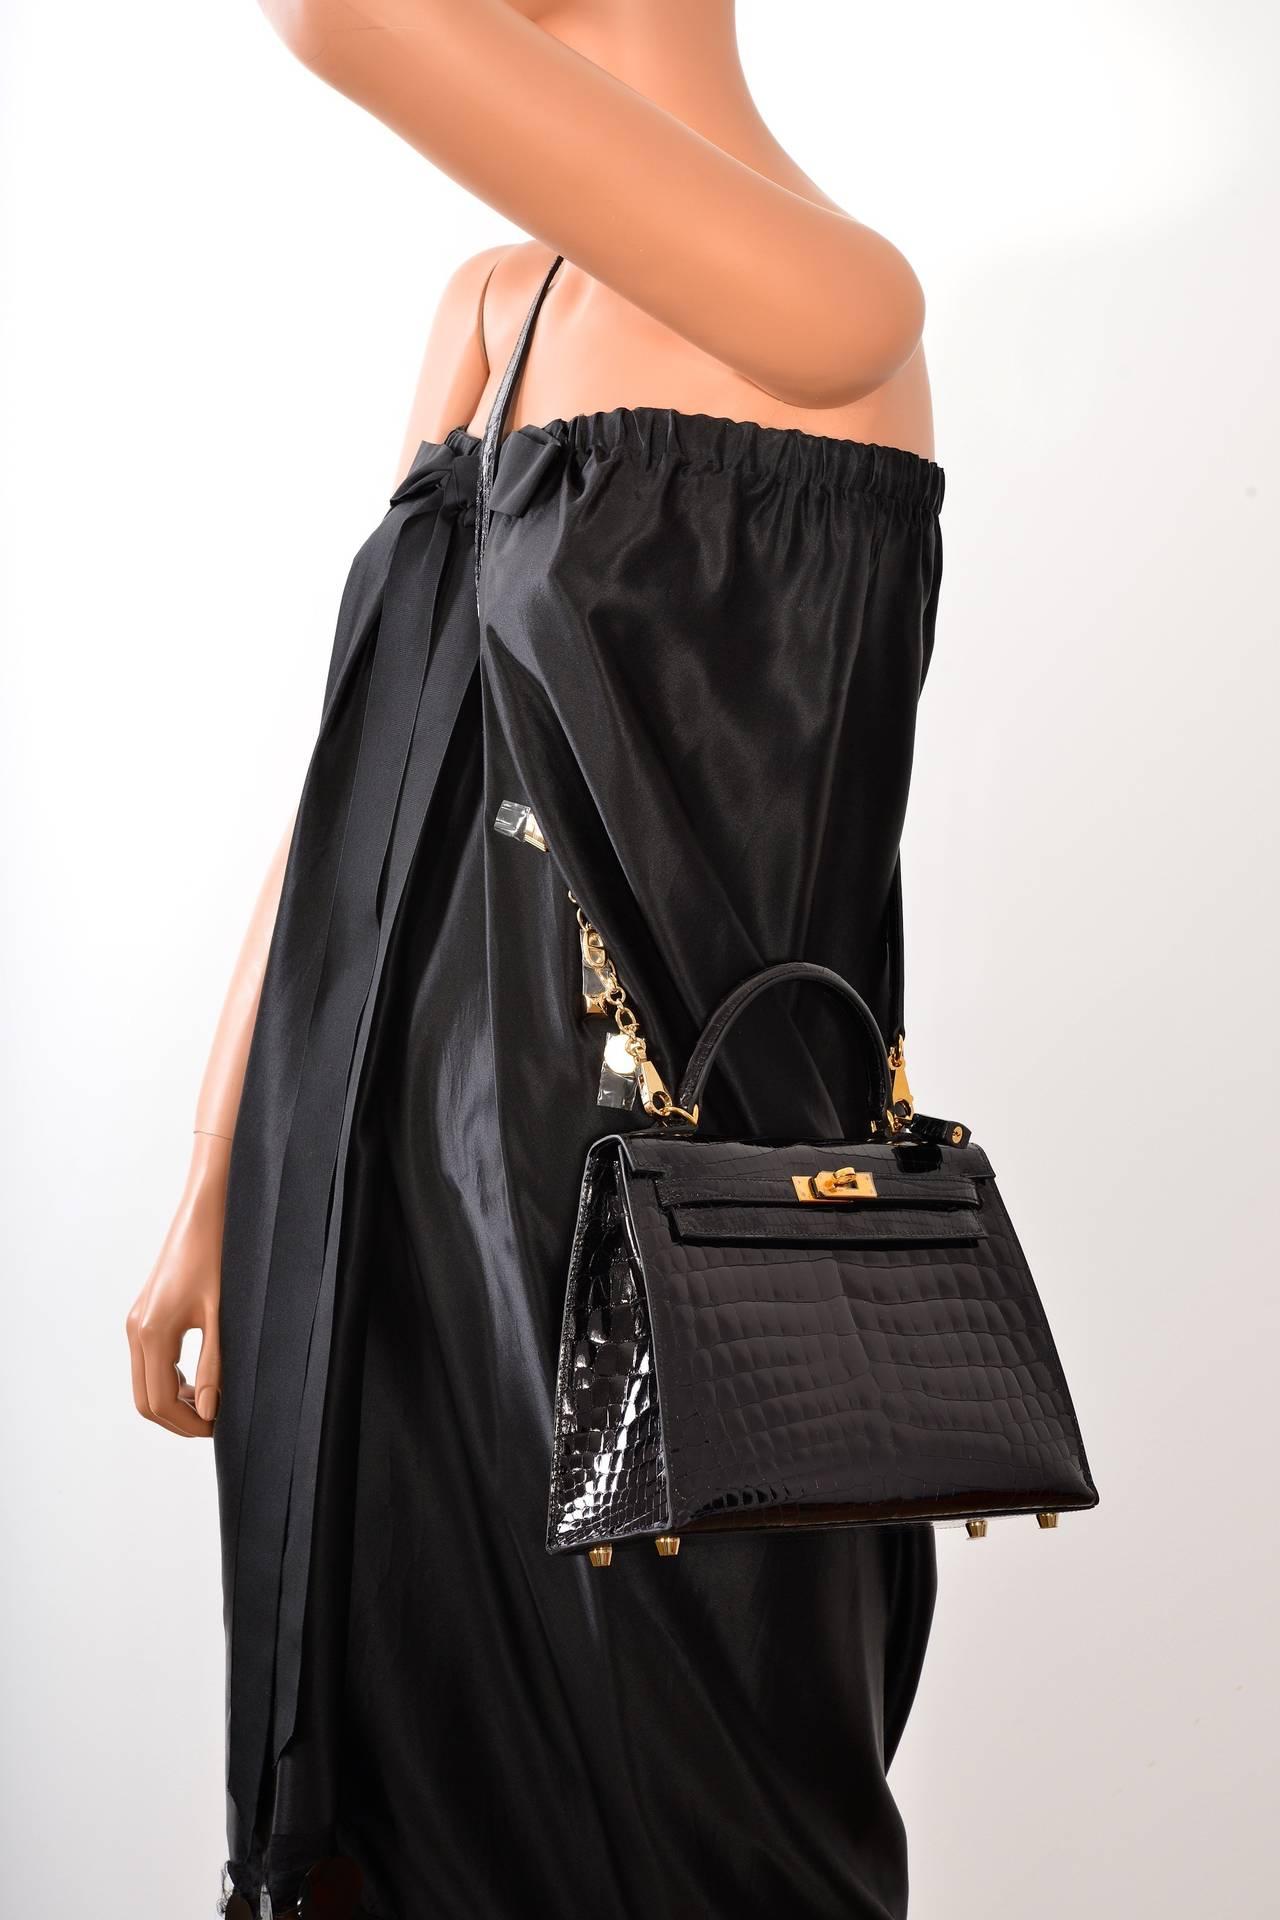 affordable leather handbags - SUPER RARE INCREDIBLE HERMES KELLY BAG 25cm  BLACK NILO CROCODILE . bd0d3d5725ea6